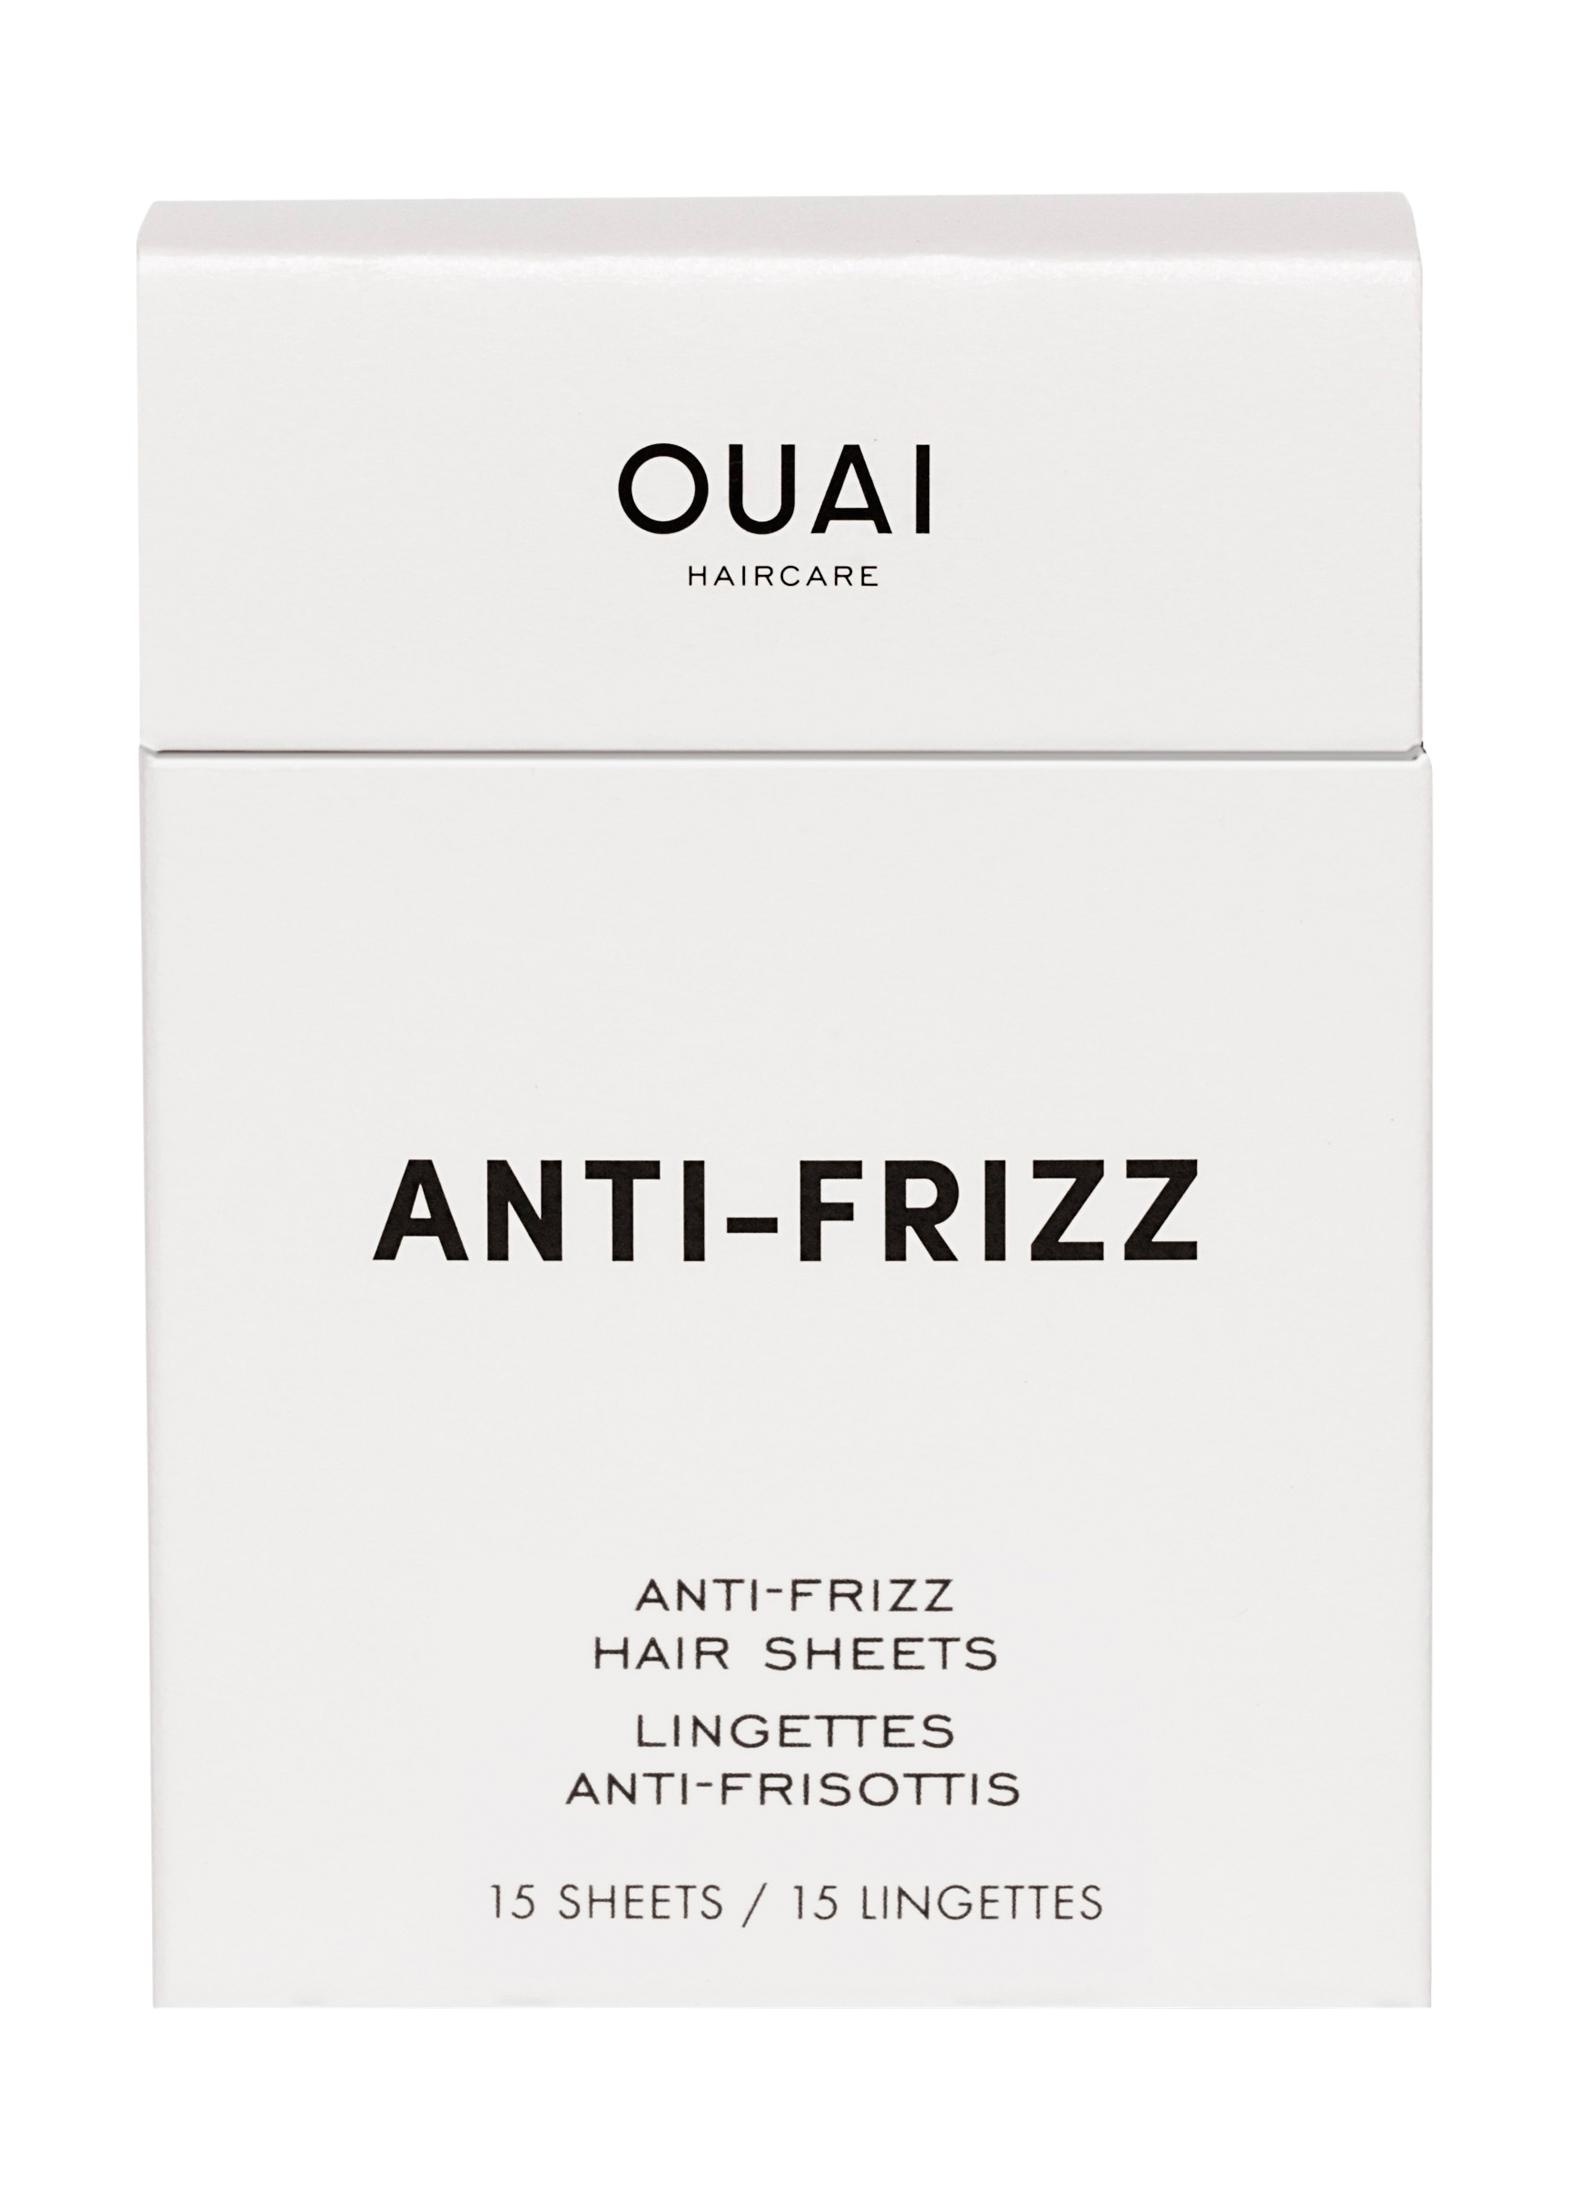 Ouai ANTI FRIZZ SHEETS (15 sheets) image number 0